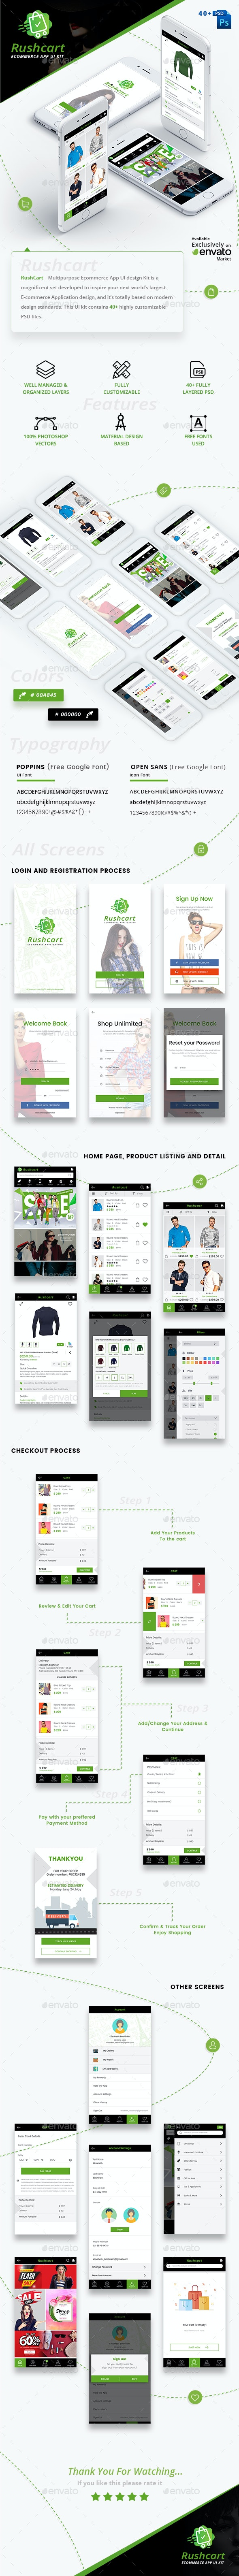 RushCart  - Multipurpose Ecommerce App UI Kit - User Interfaces Web Elements